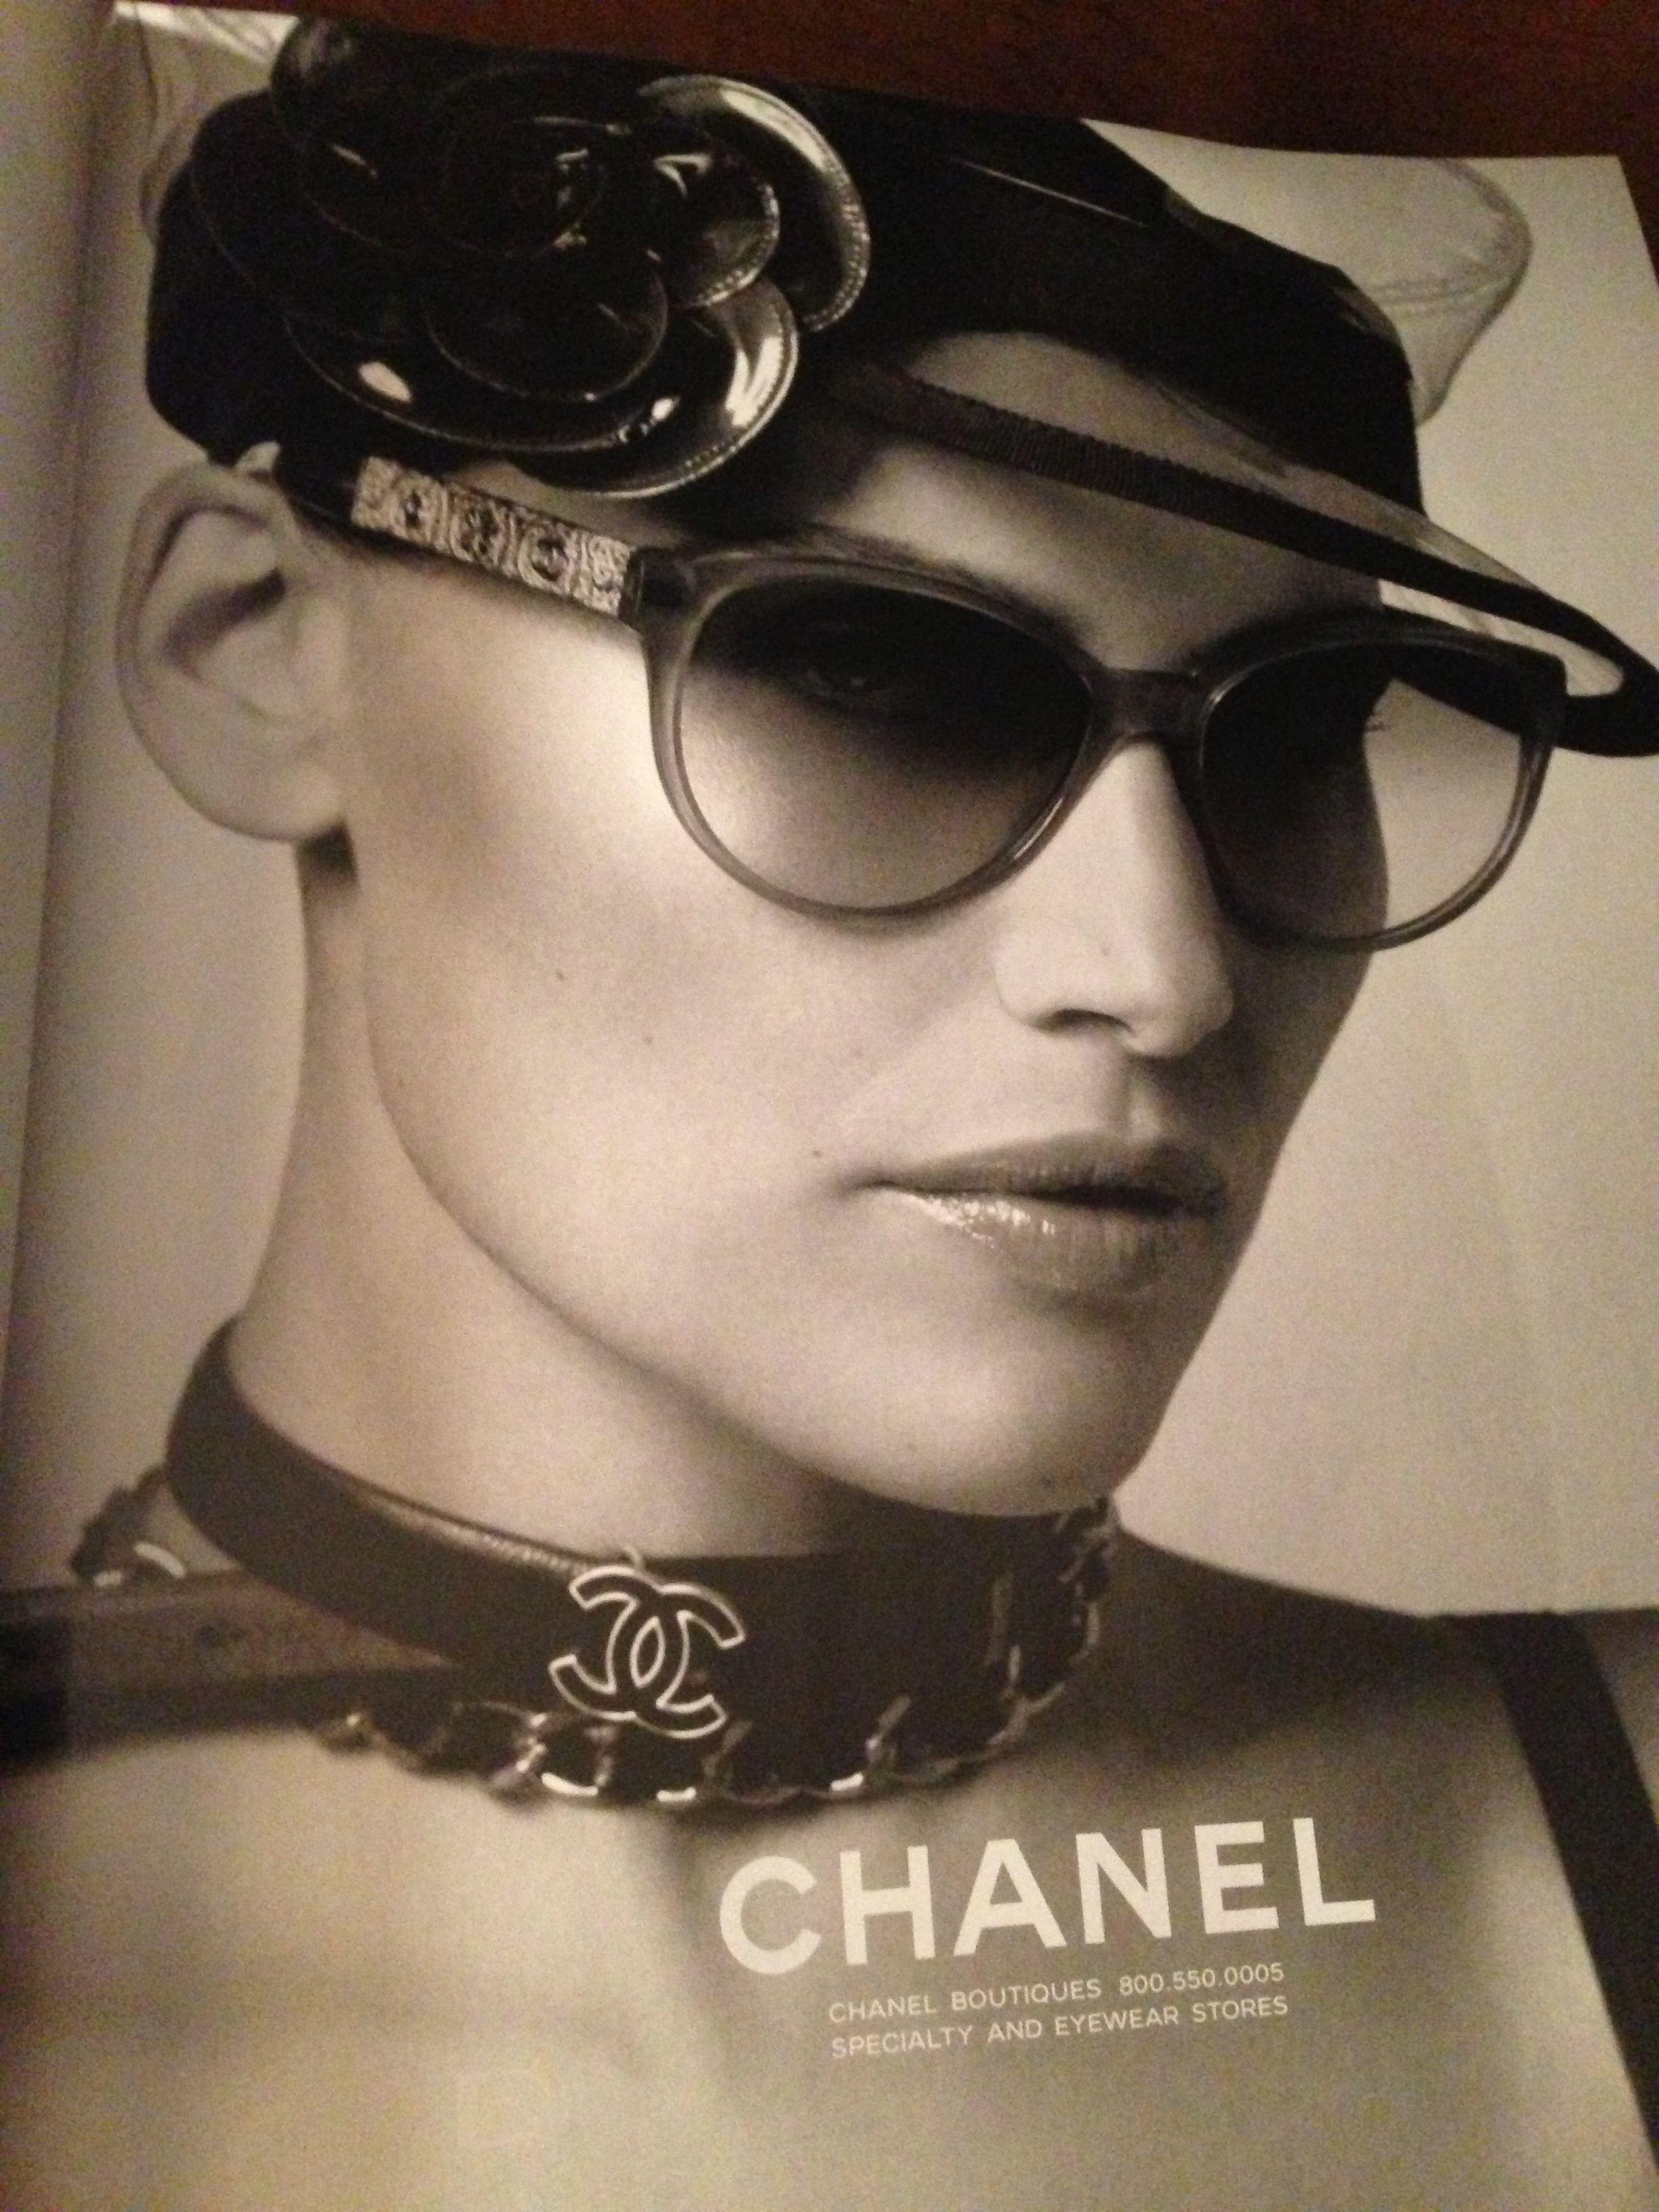 Chanel eyewear 2013   Eye See You!   Sunglasses outlet ...Chanel Sunglasses 2013 Women